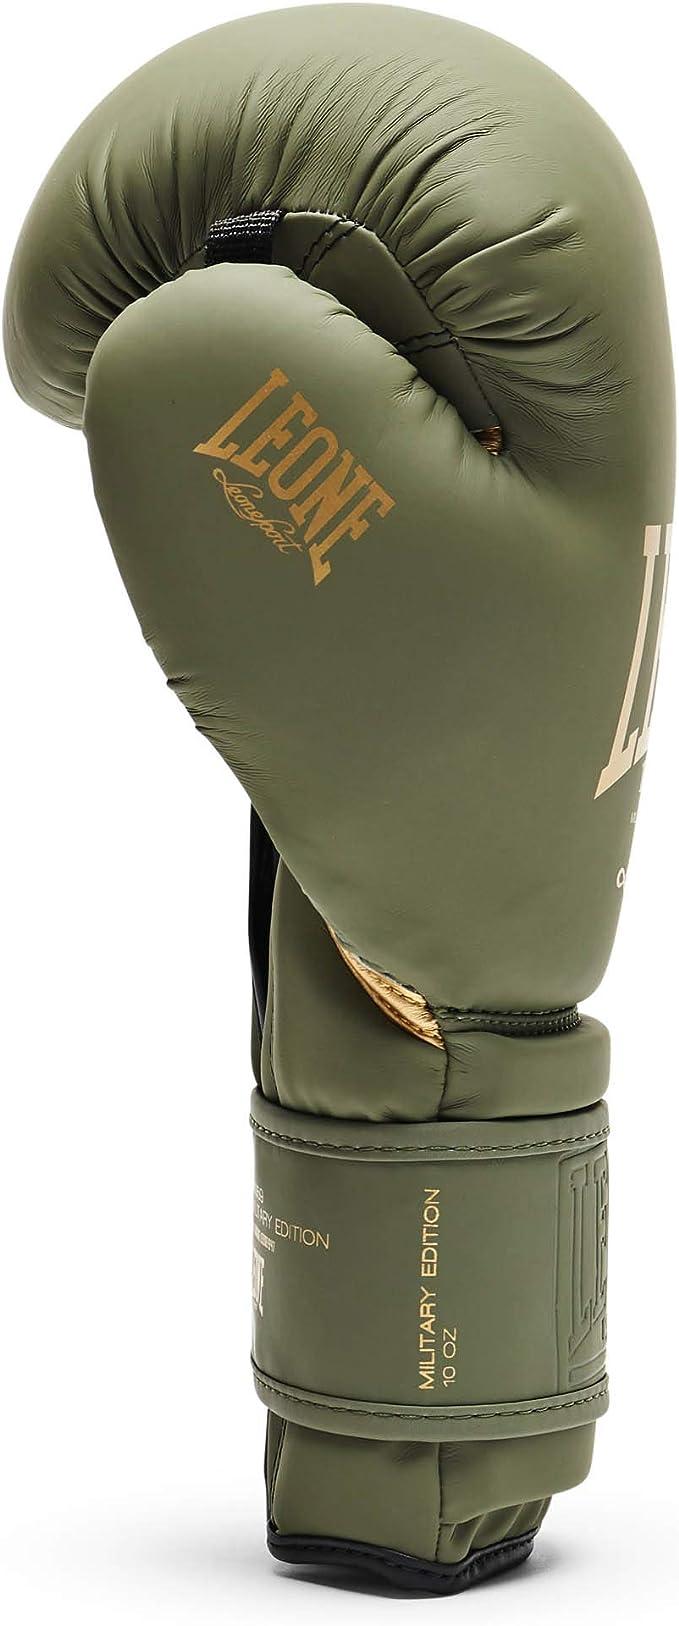 XL Vert Gants MMA Unisexe Leone 1947 Gants MMA Military Ed Adulte